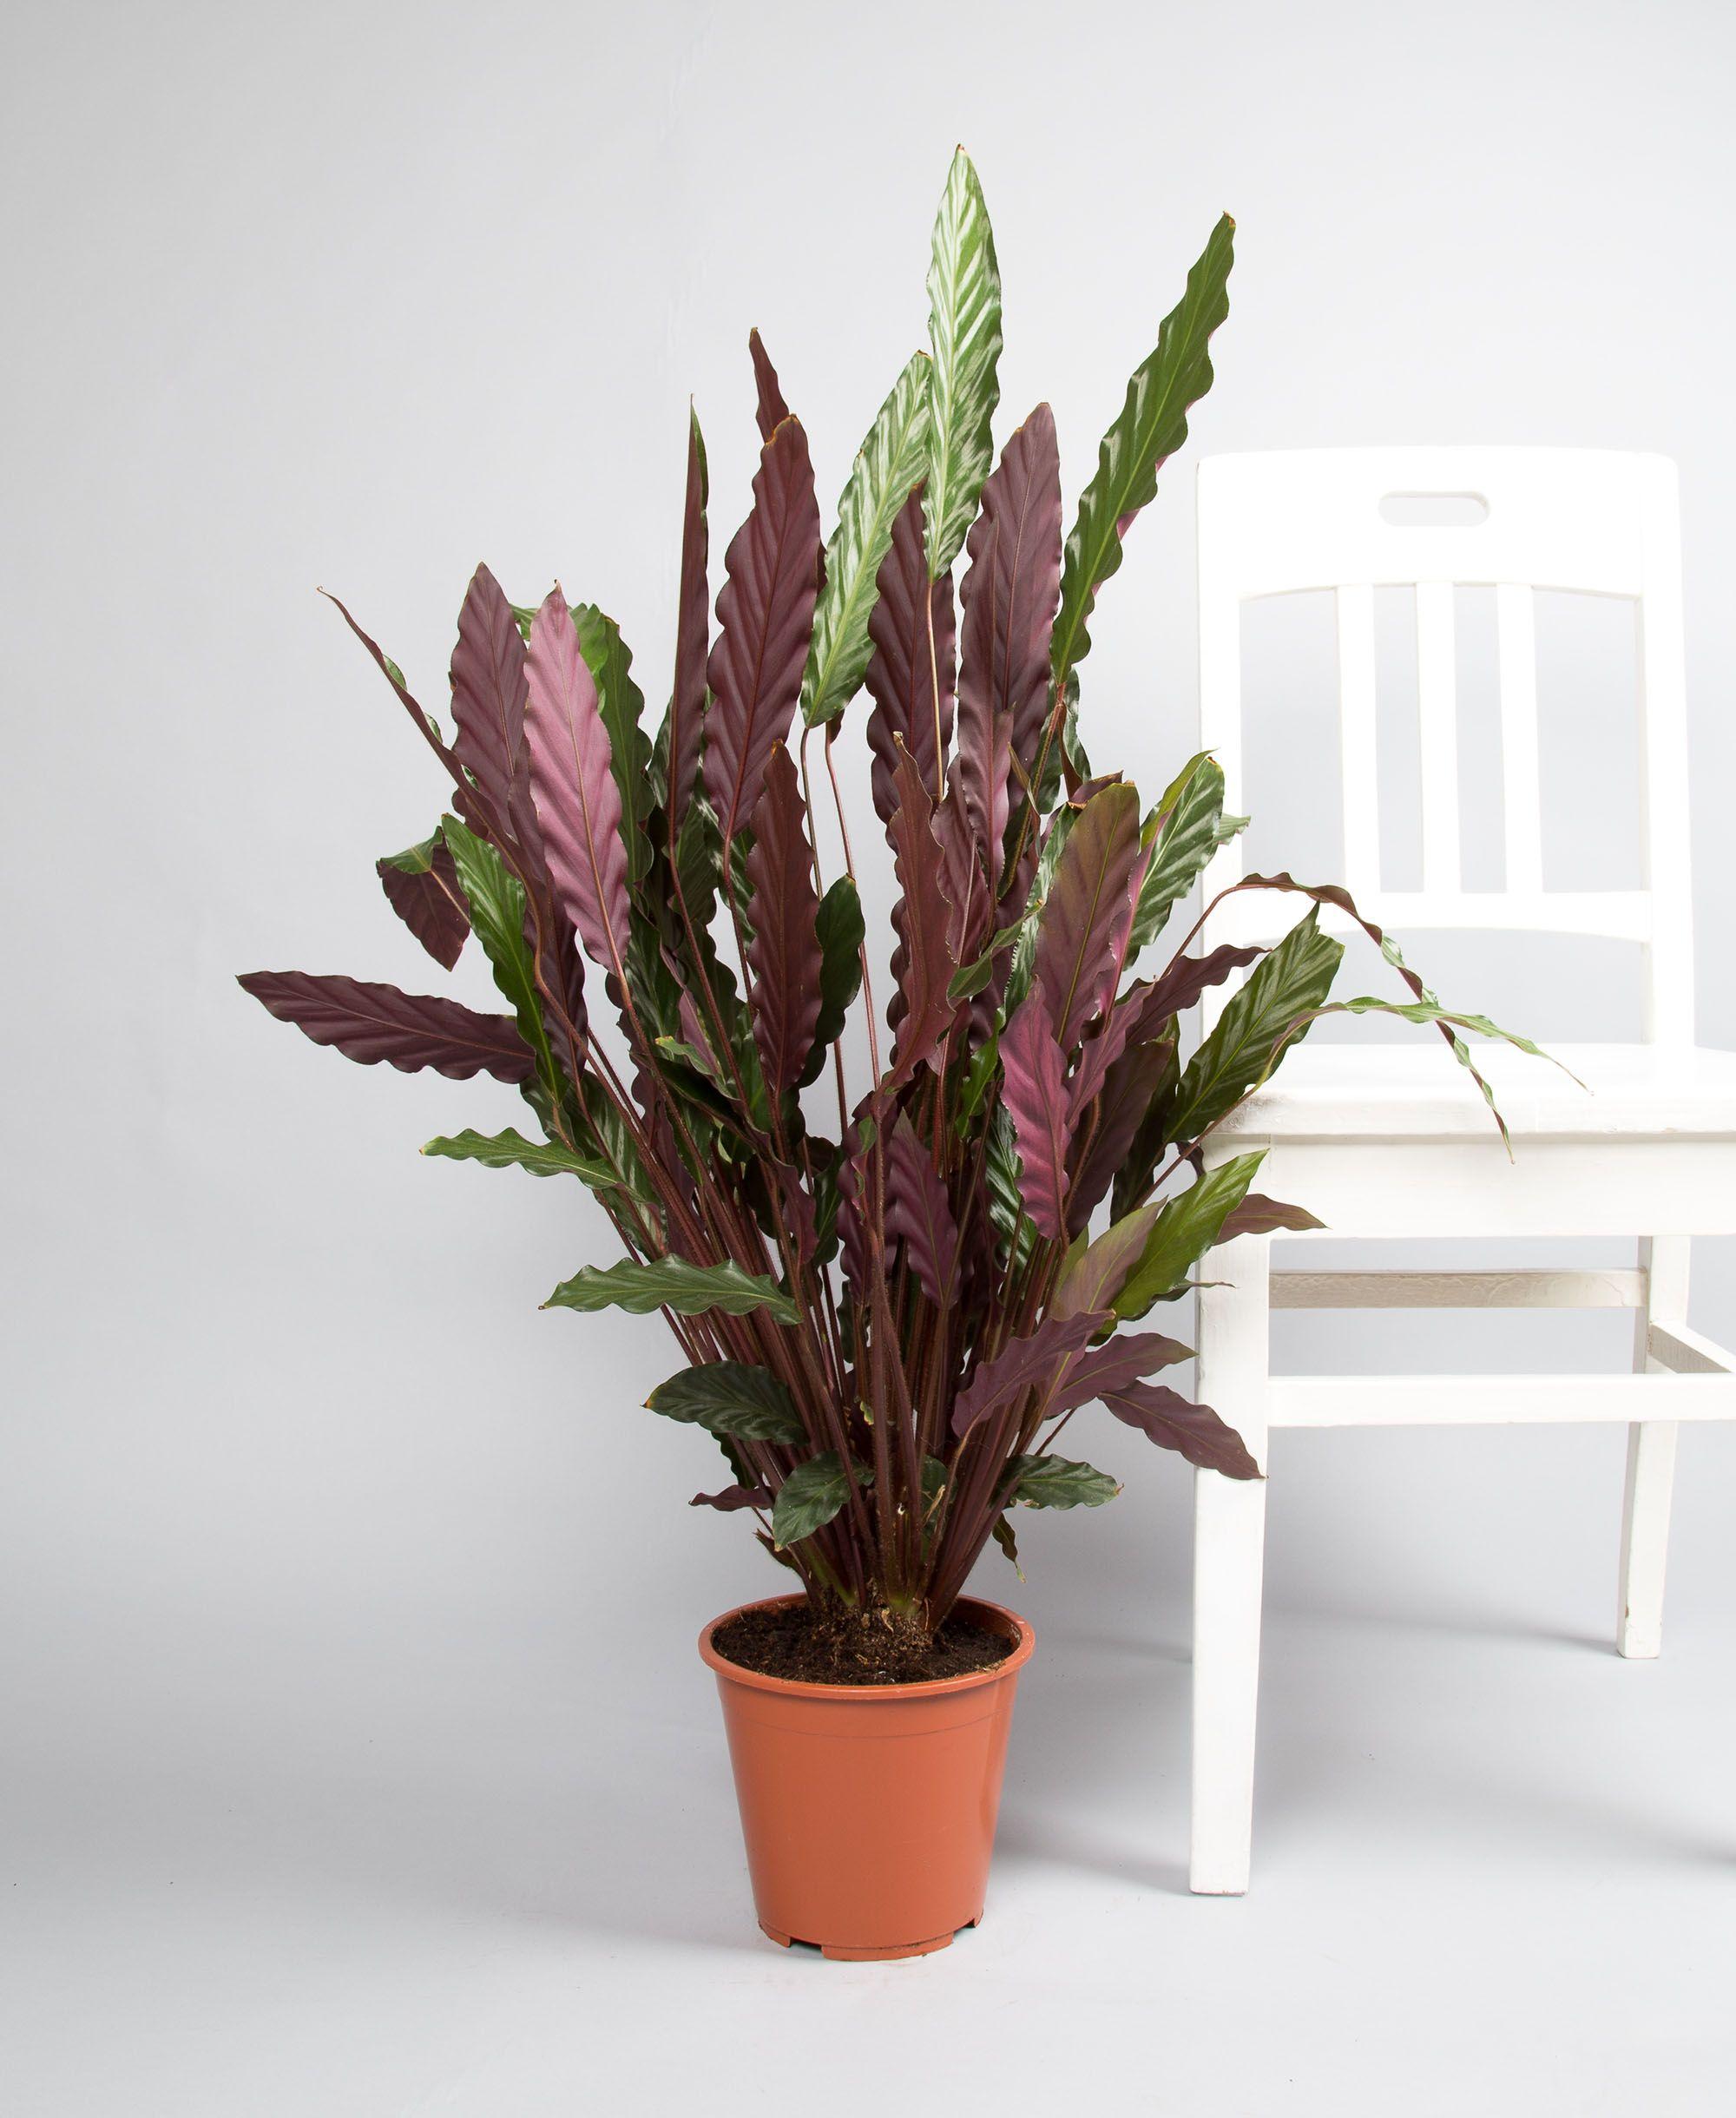 Tropical Plants Calathea Rufibarba Fenzl Wavestar